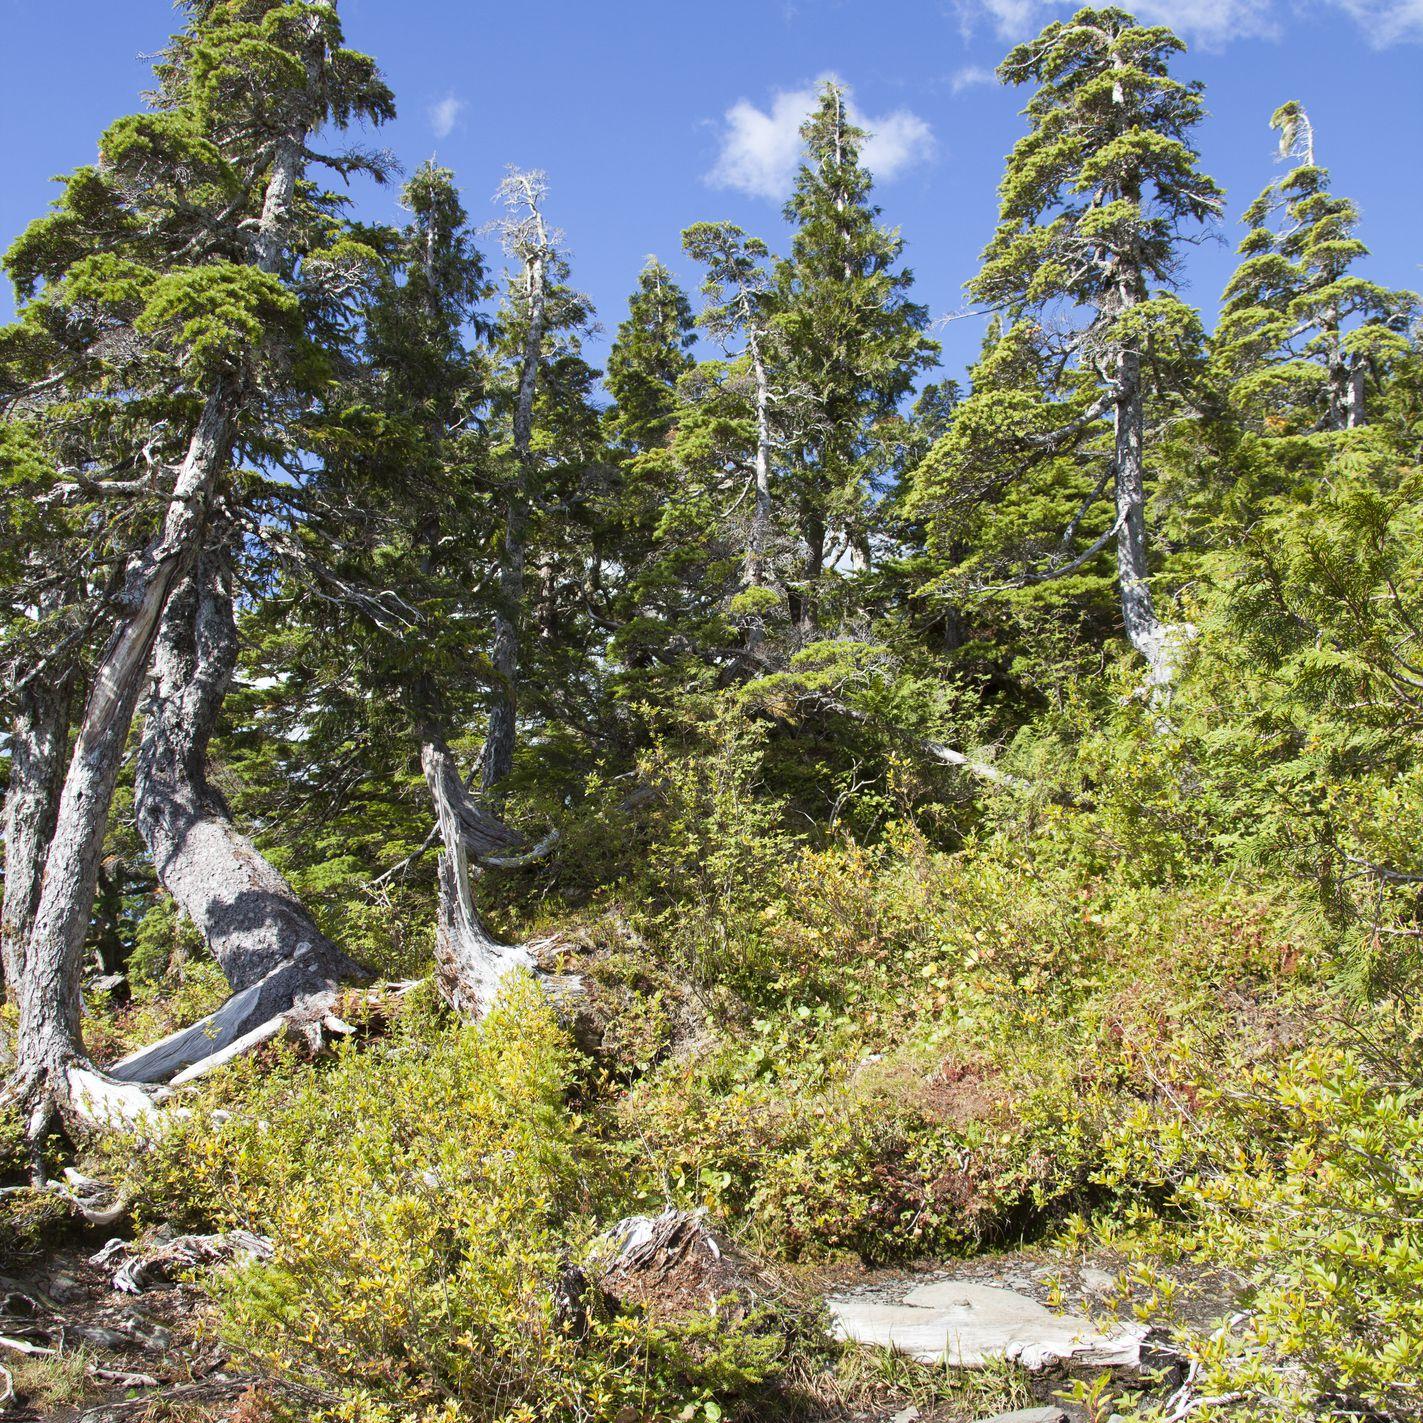 The hiking footpath to Deer Mount outside Ketchikan town (Alaska).